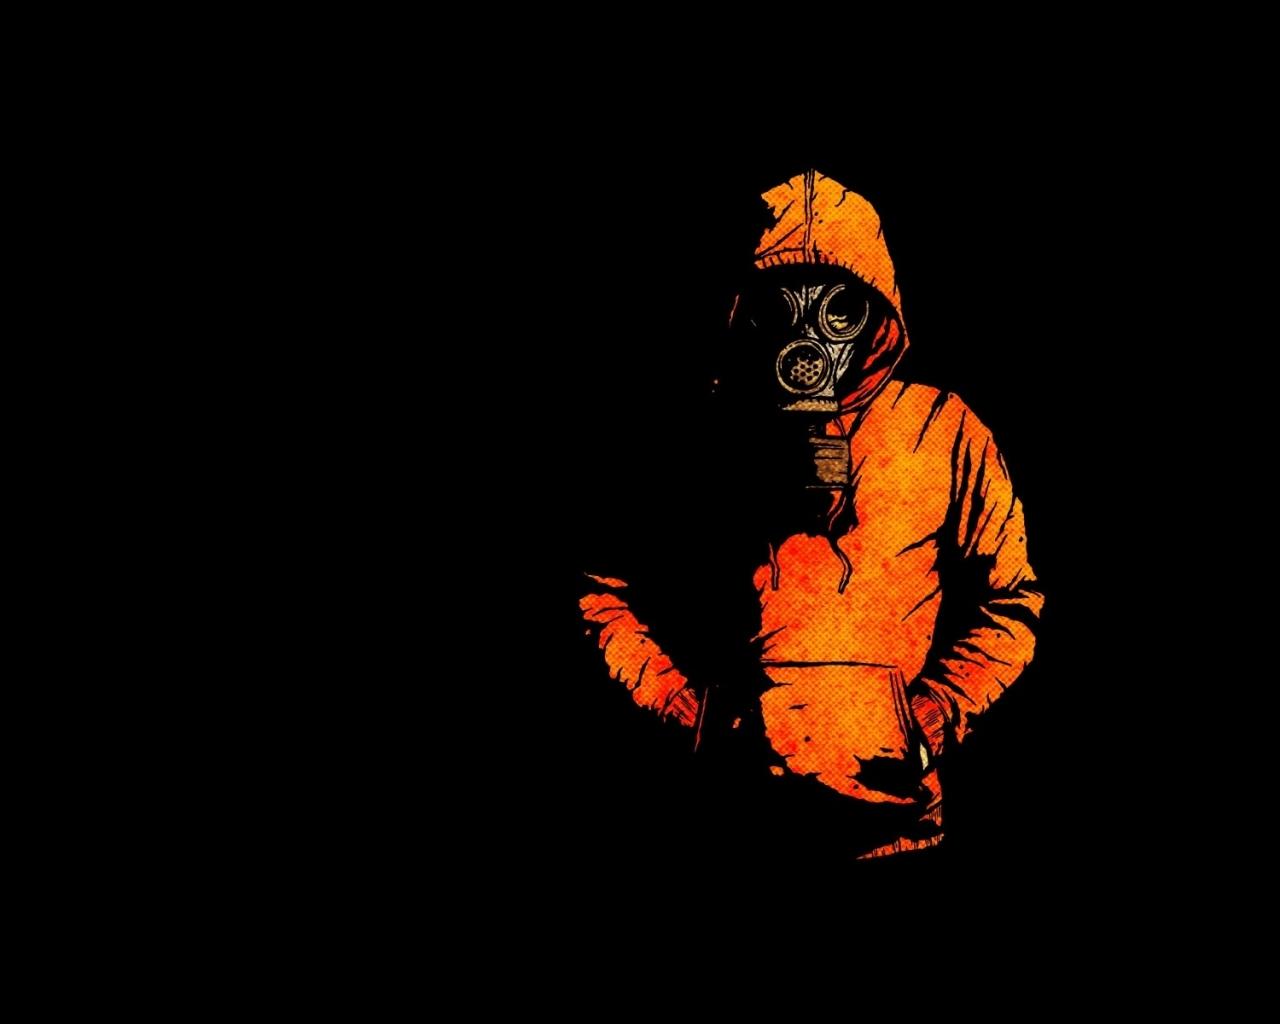 Drawn masks background Gas 1900x1200 minimalistic hoodie drawn